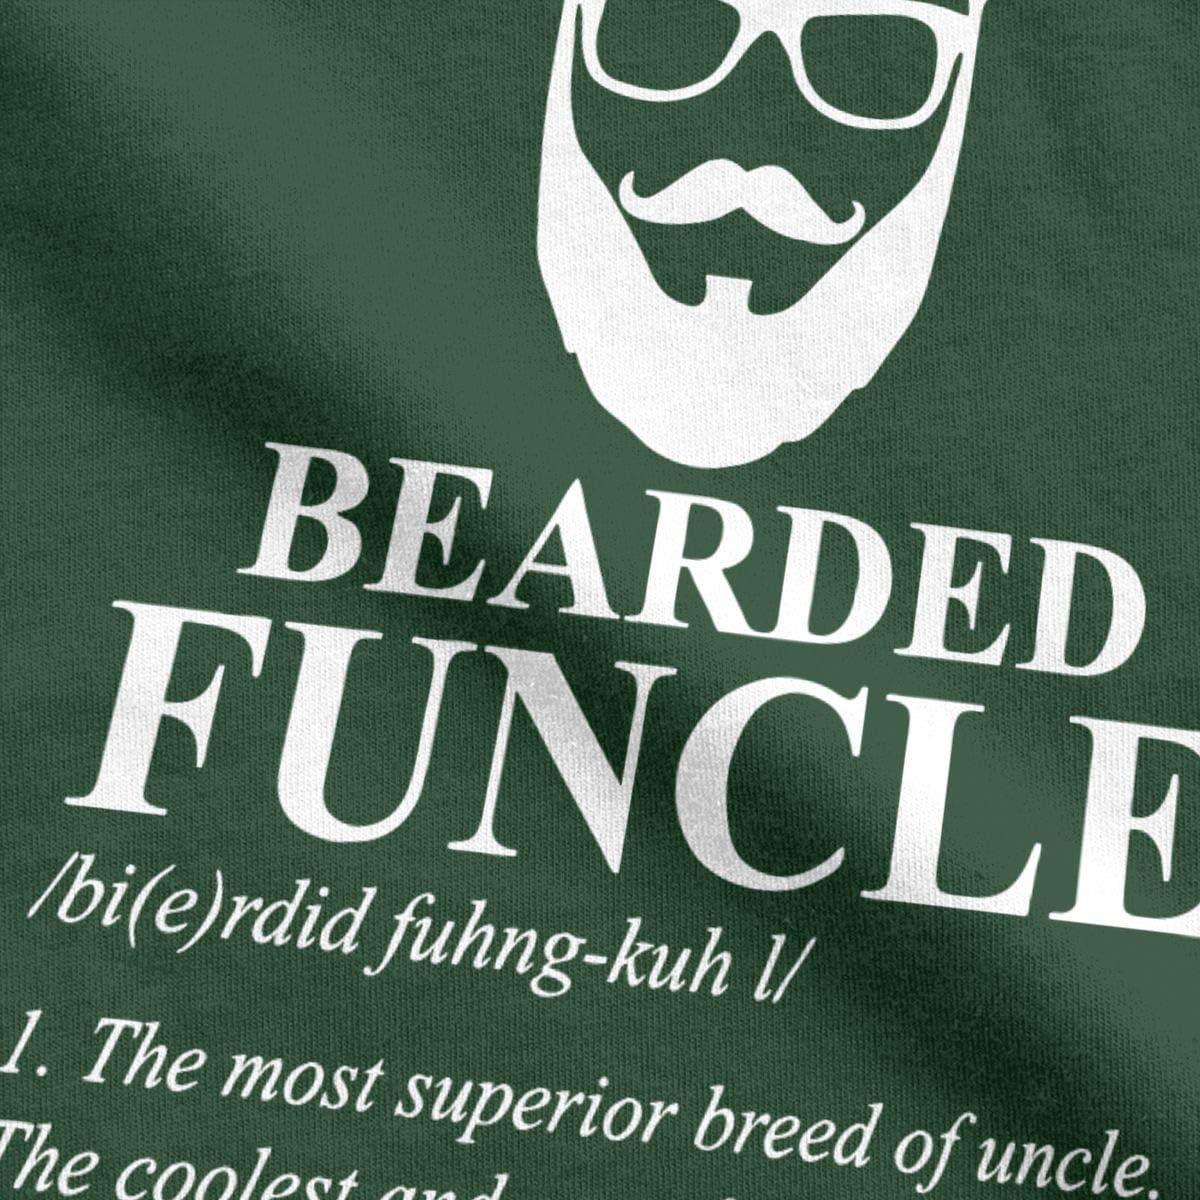 PRINTER77 Funcle Sarcastic Funny T Shirt Bearded Fun Uncle Mens Tops Tees